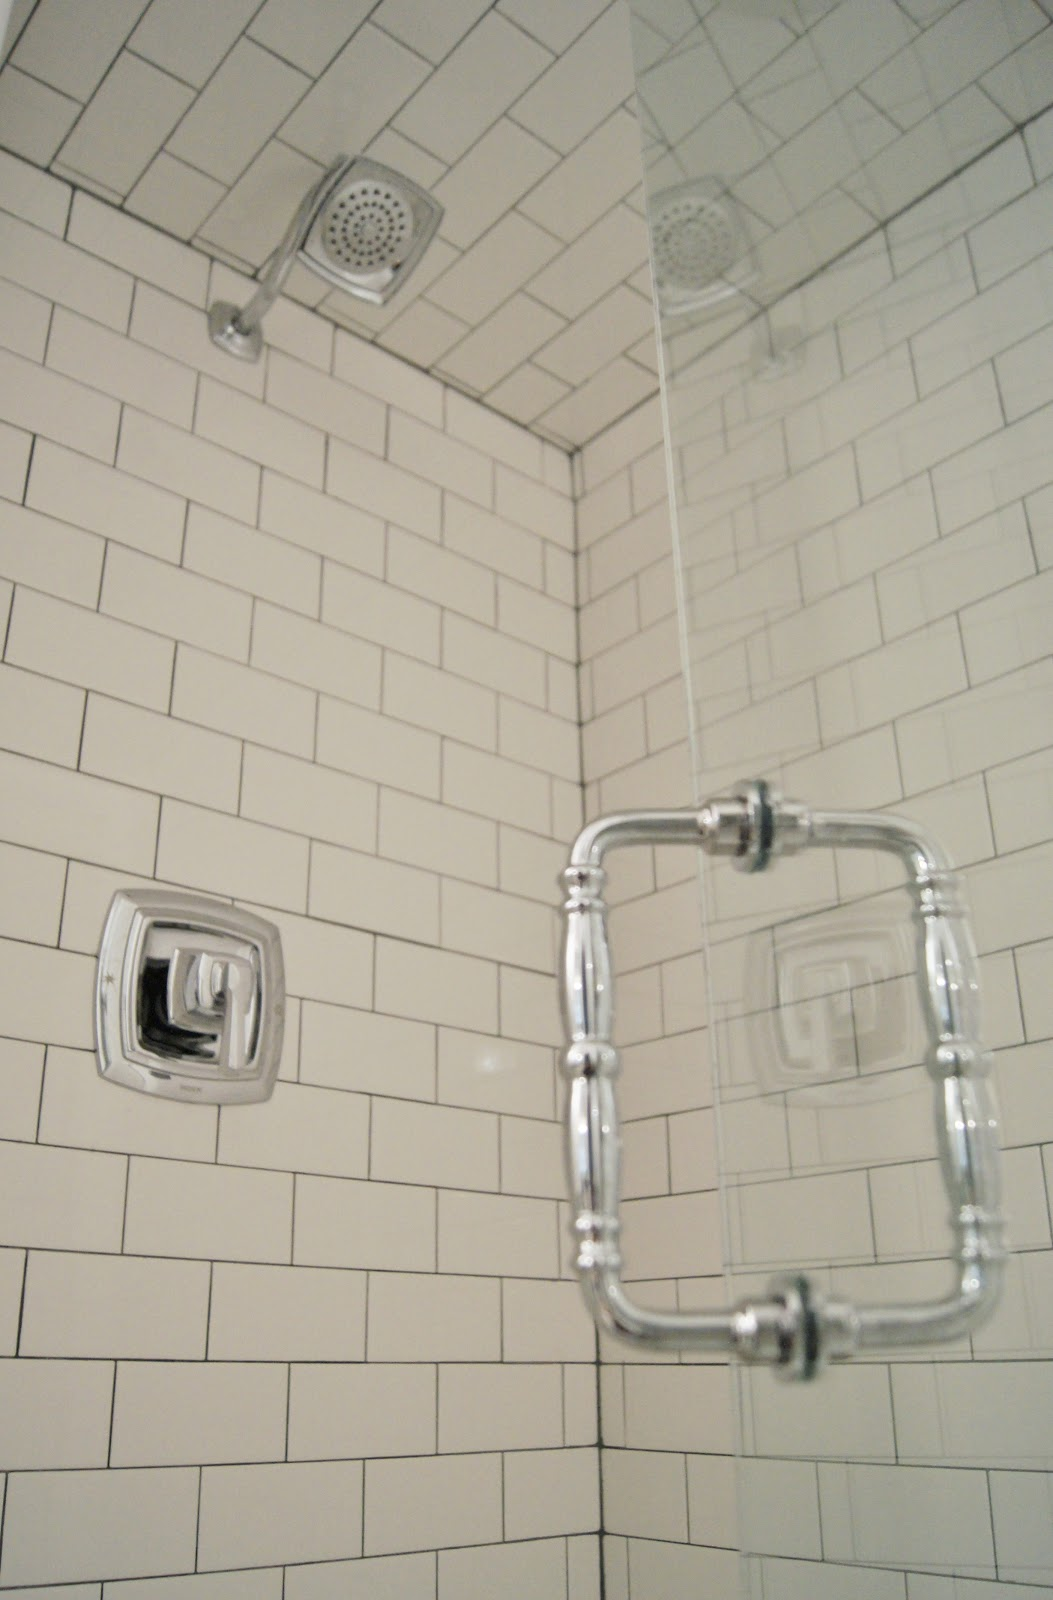 Marble Subway Tile Shower Offering The Sense Of Elegance